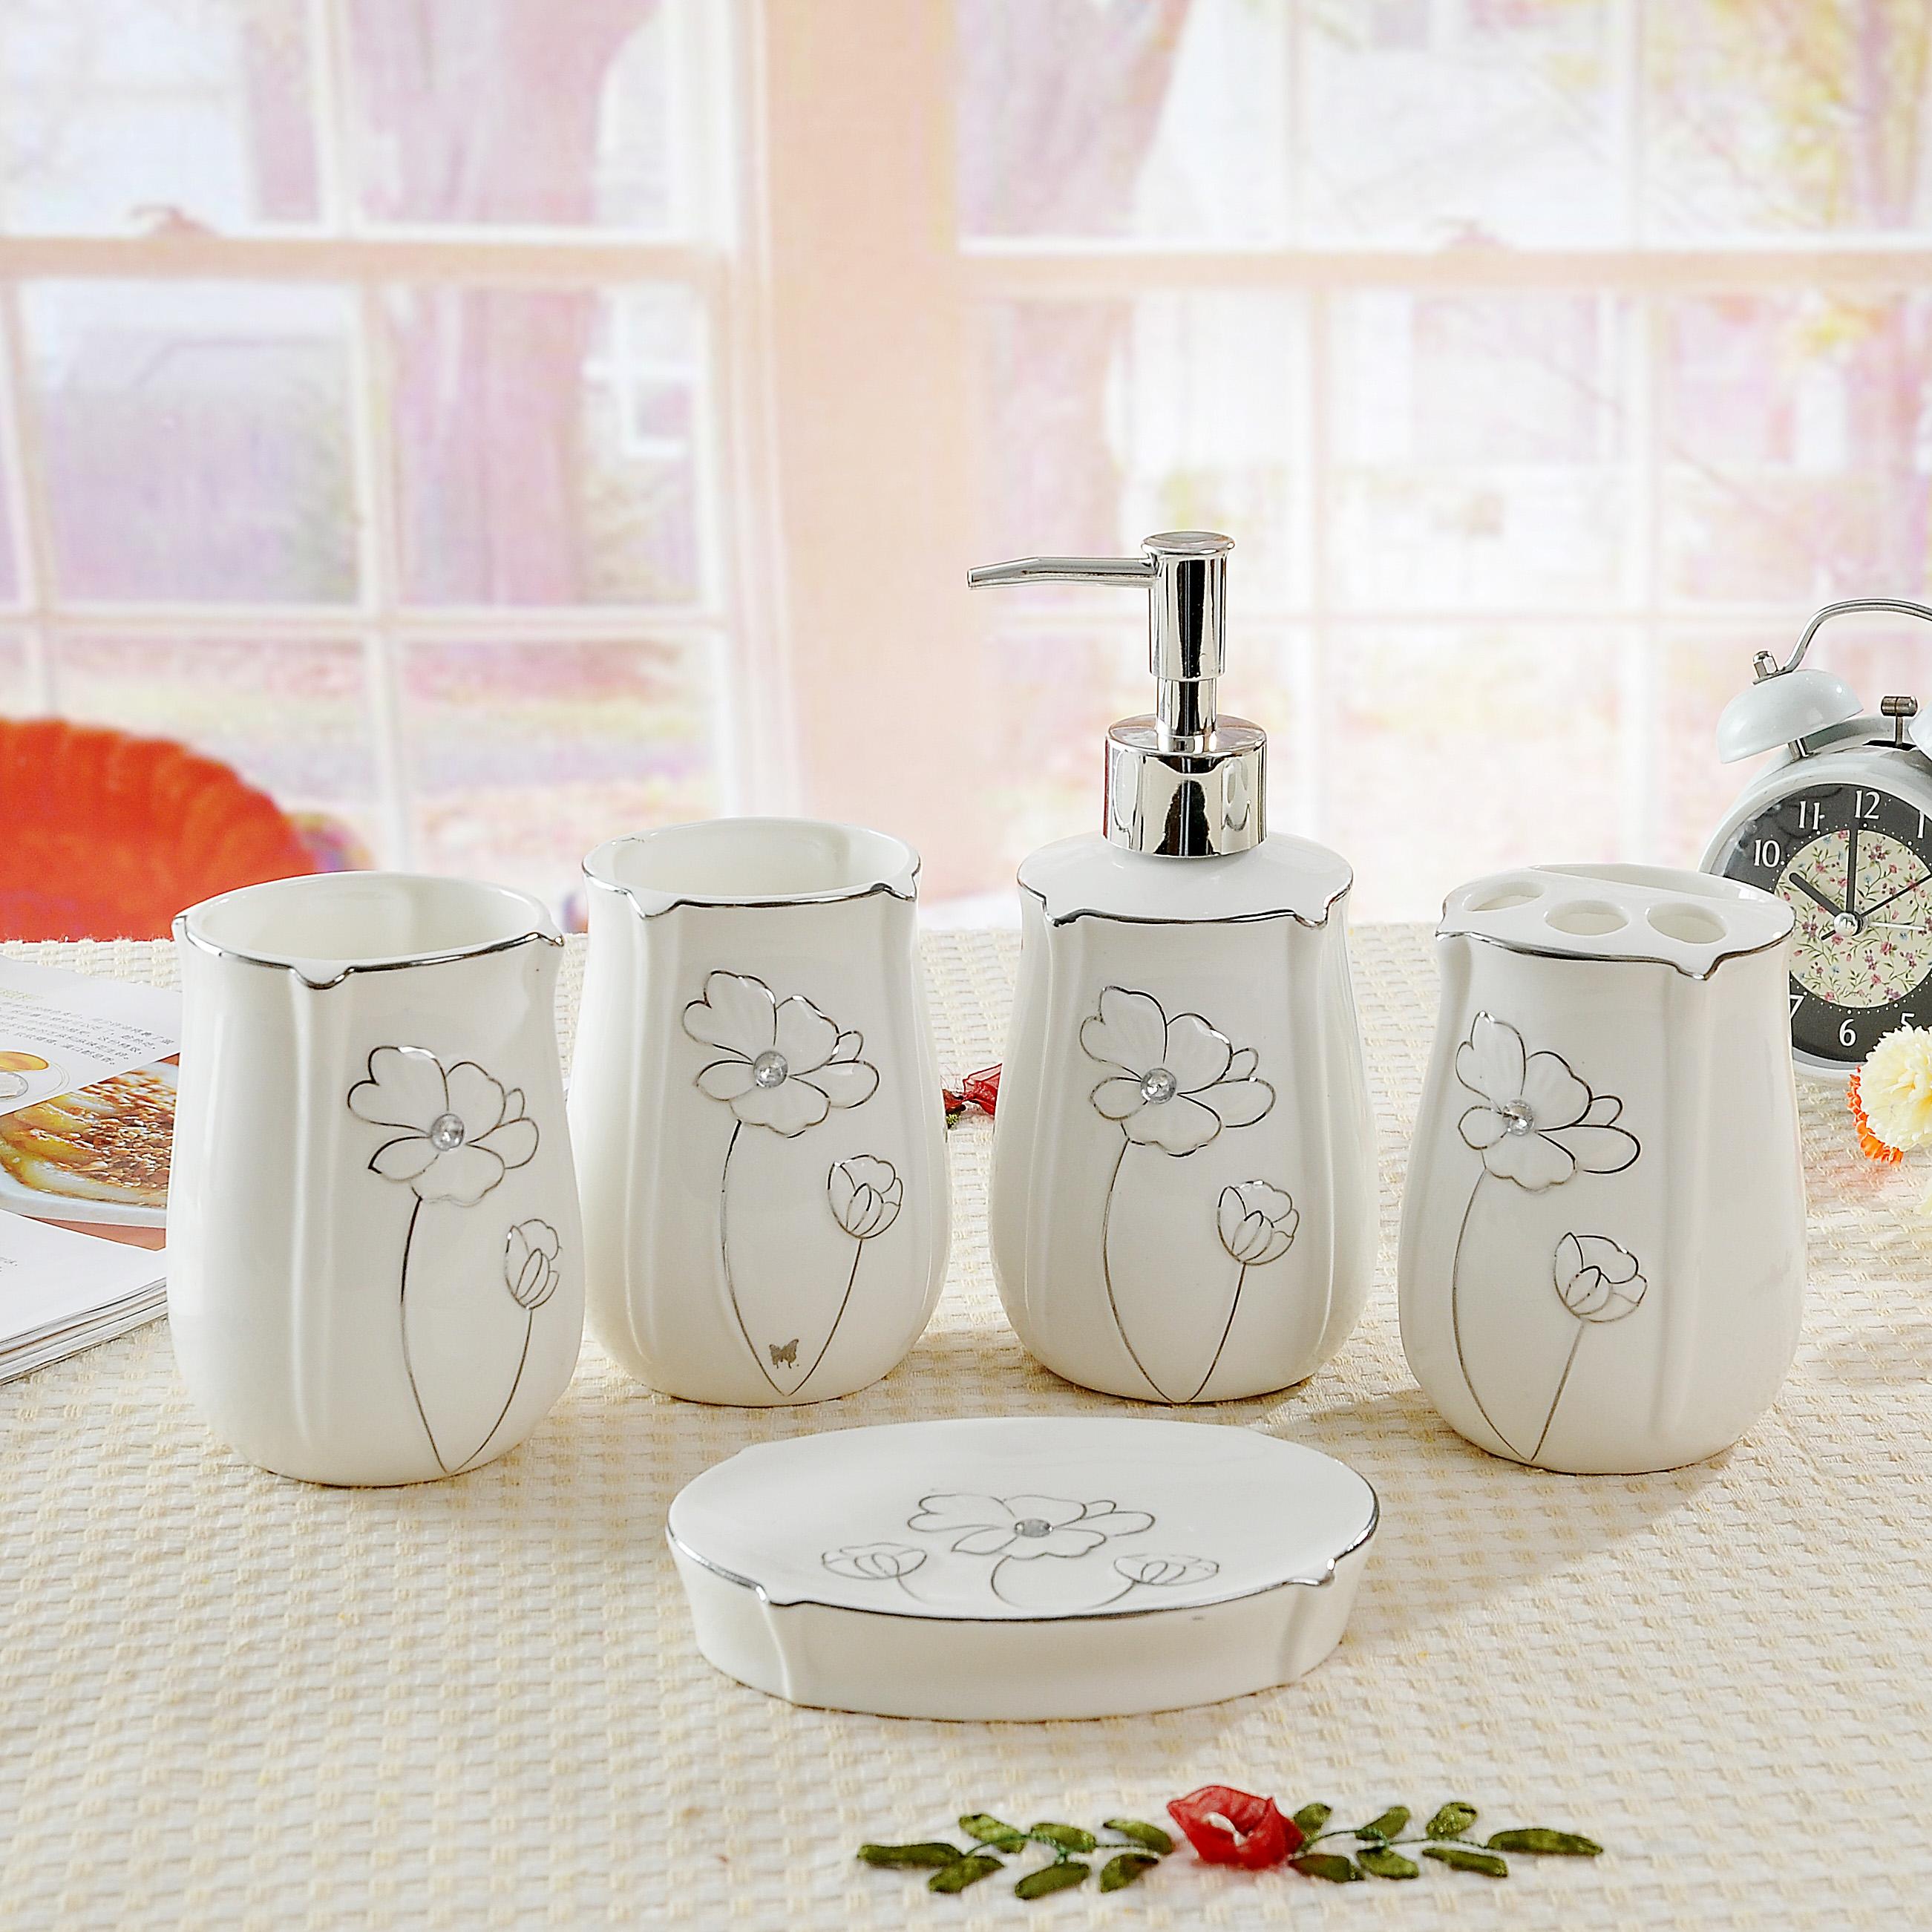 Five Pieces Ceramic Bathroom Set Shukoubei Bathroom Accessories Kit Inbathroom Accessories Sets